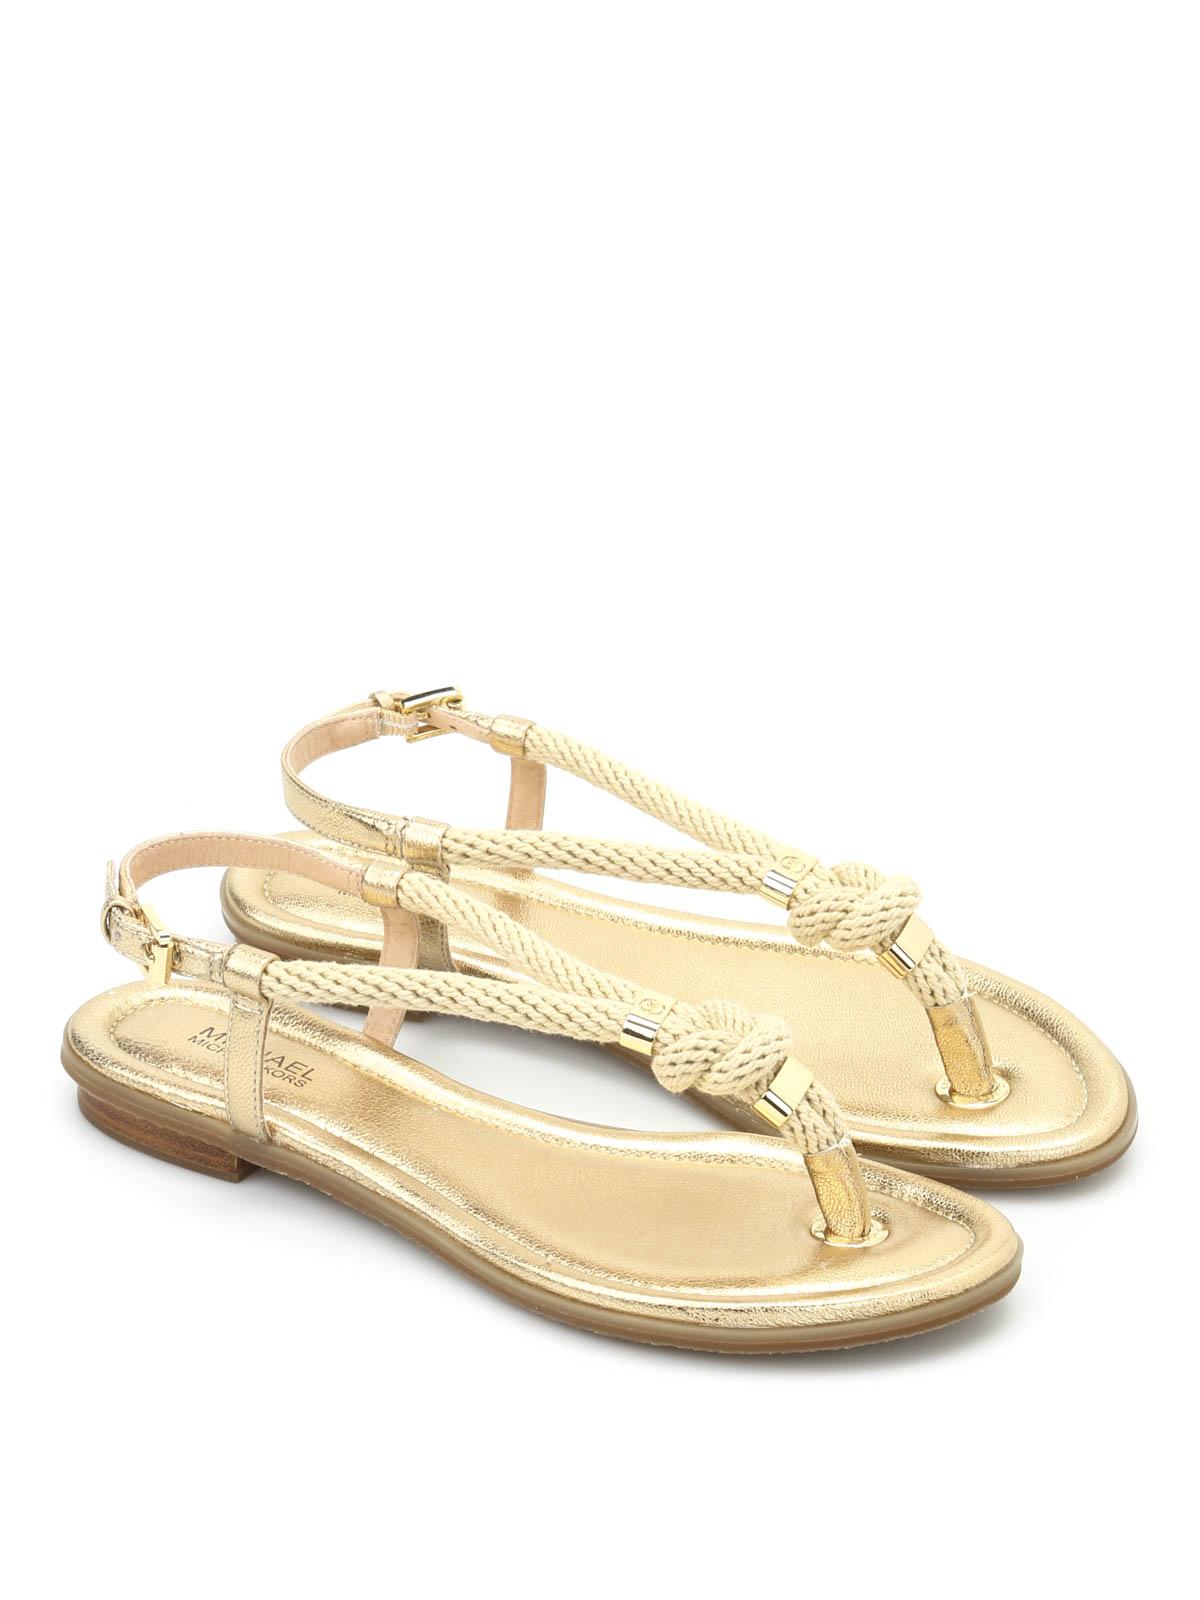 Michael Kors - Holly sandals - sandals